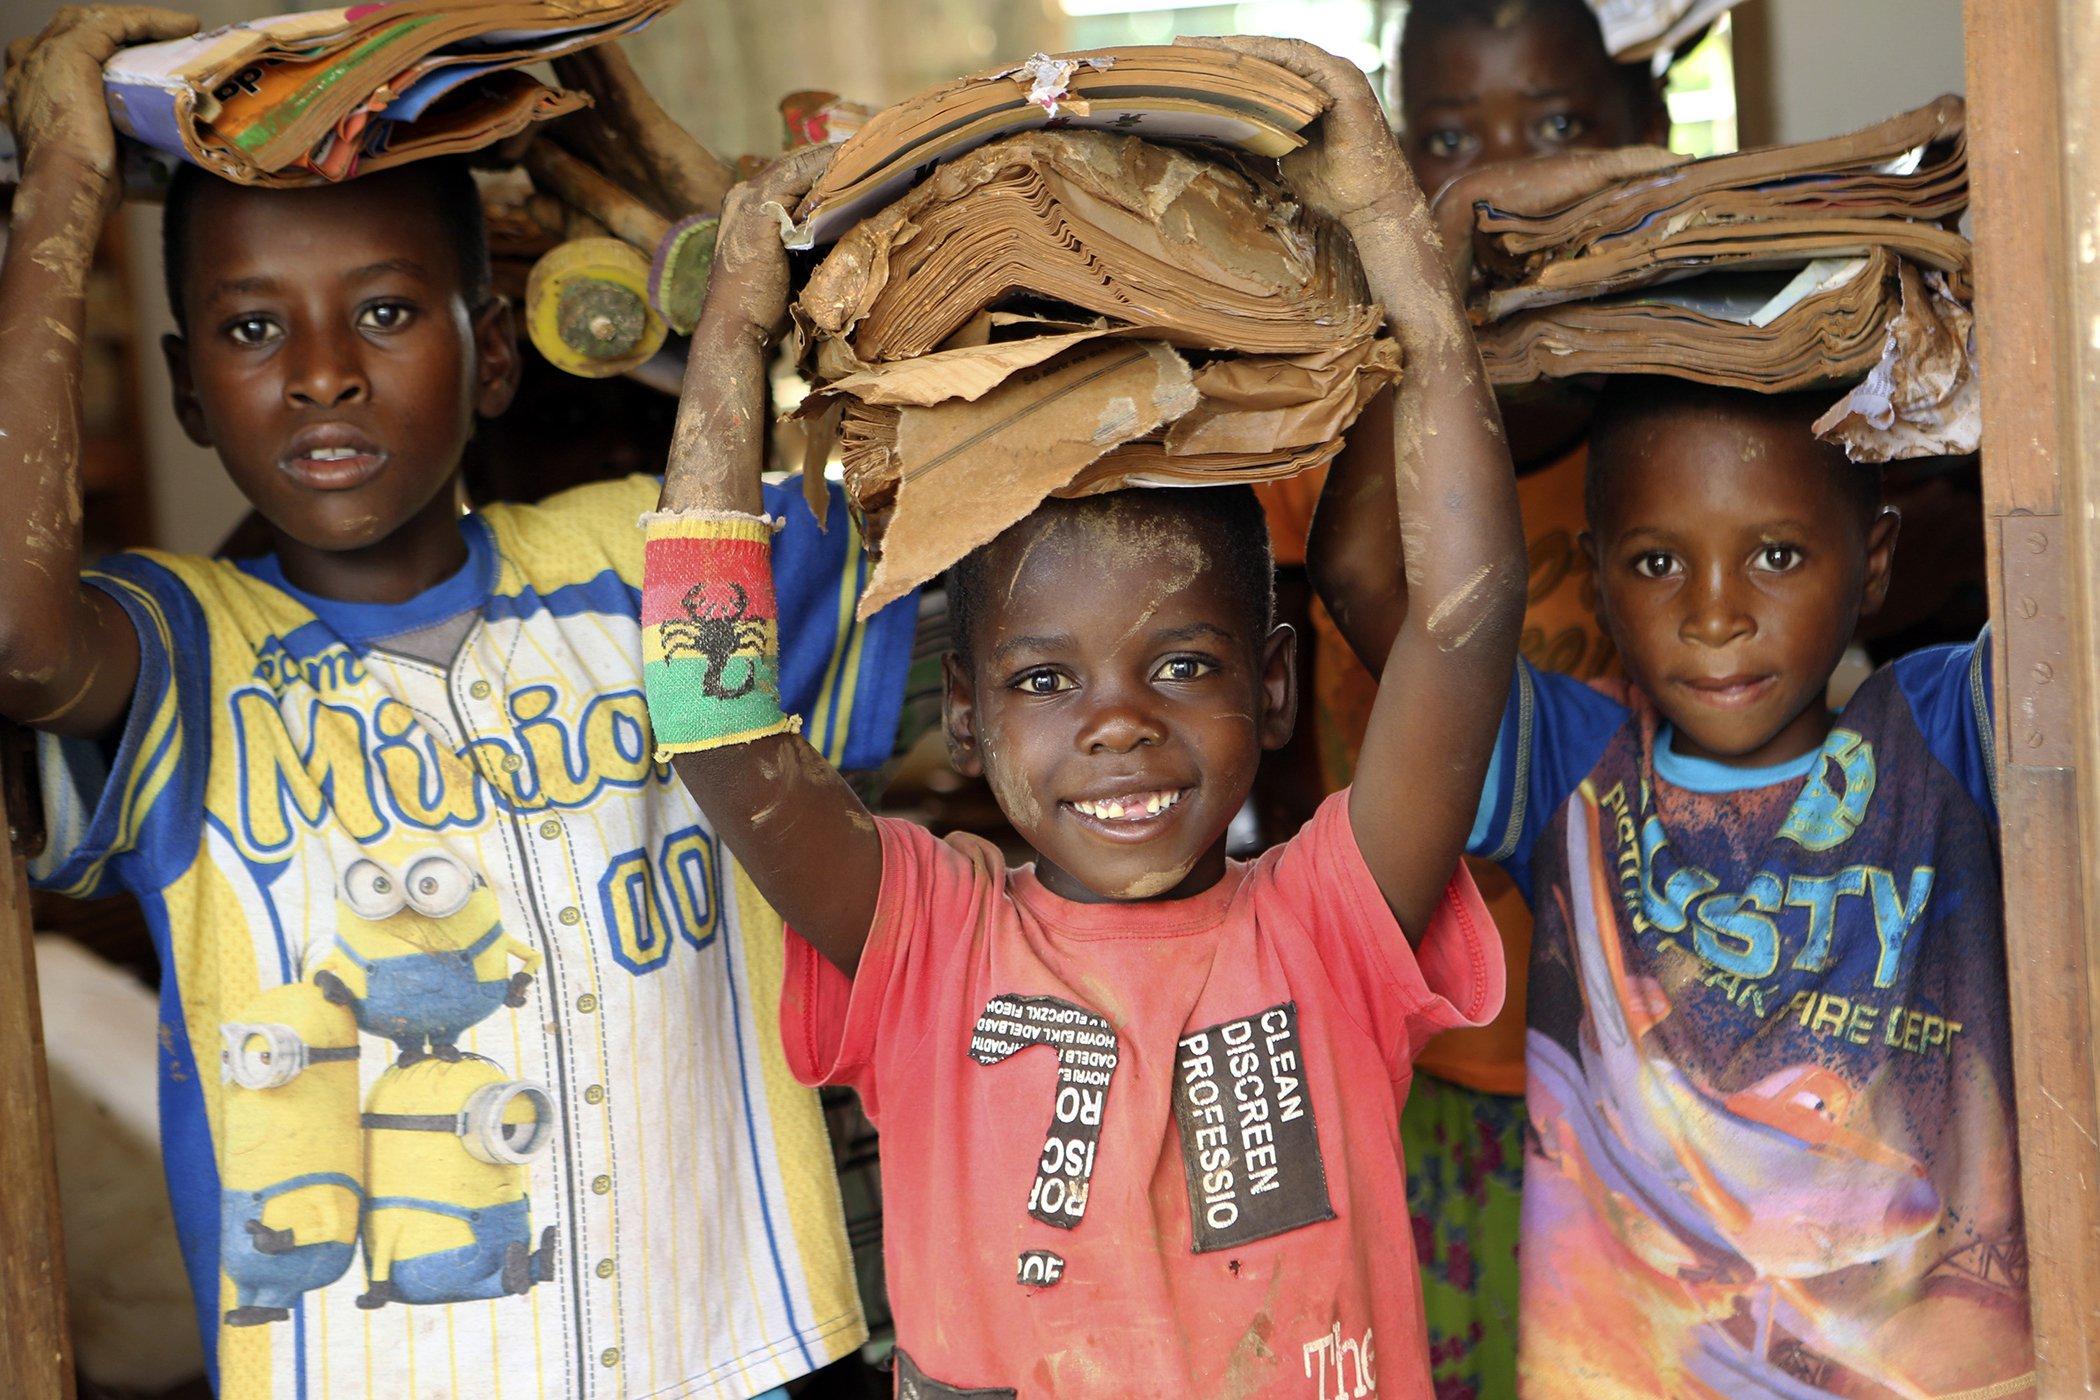 Mozambique-Cyclone-Aftermath-Cholera.jpg